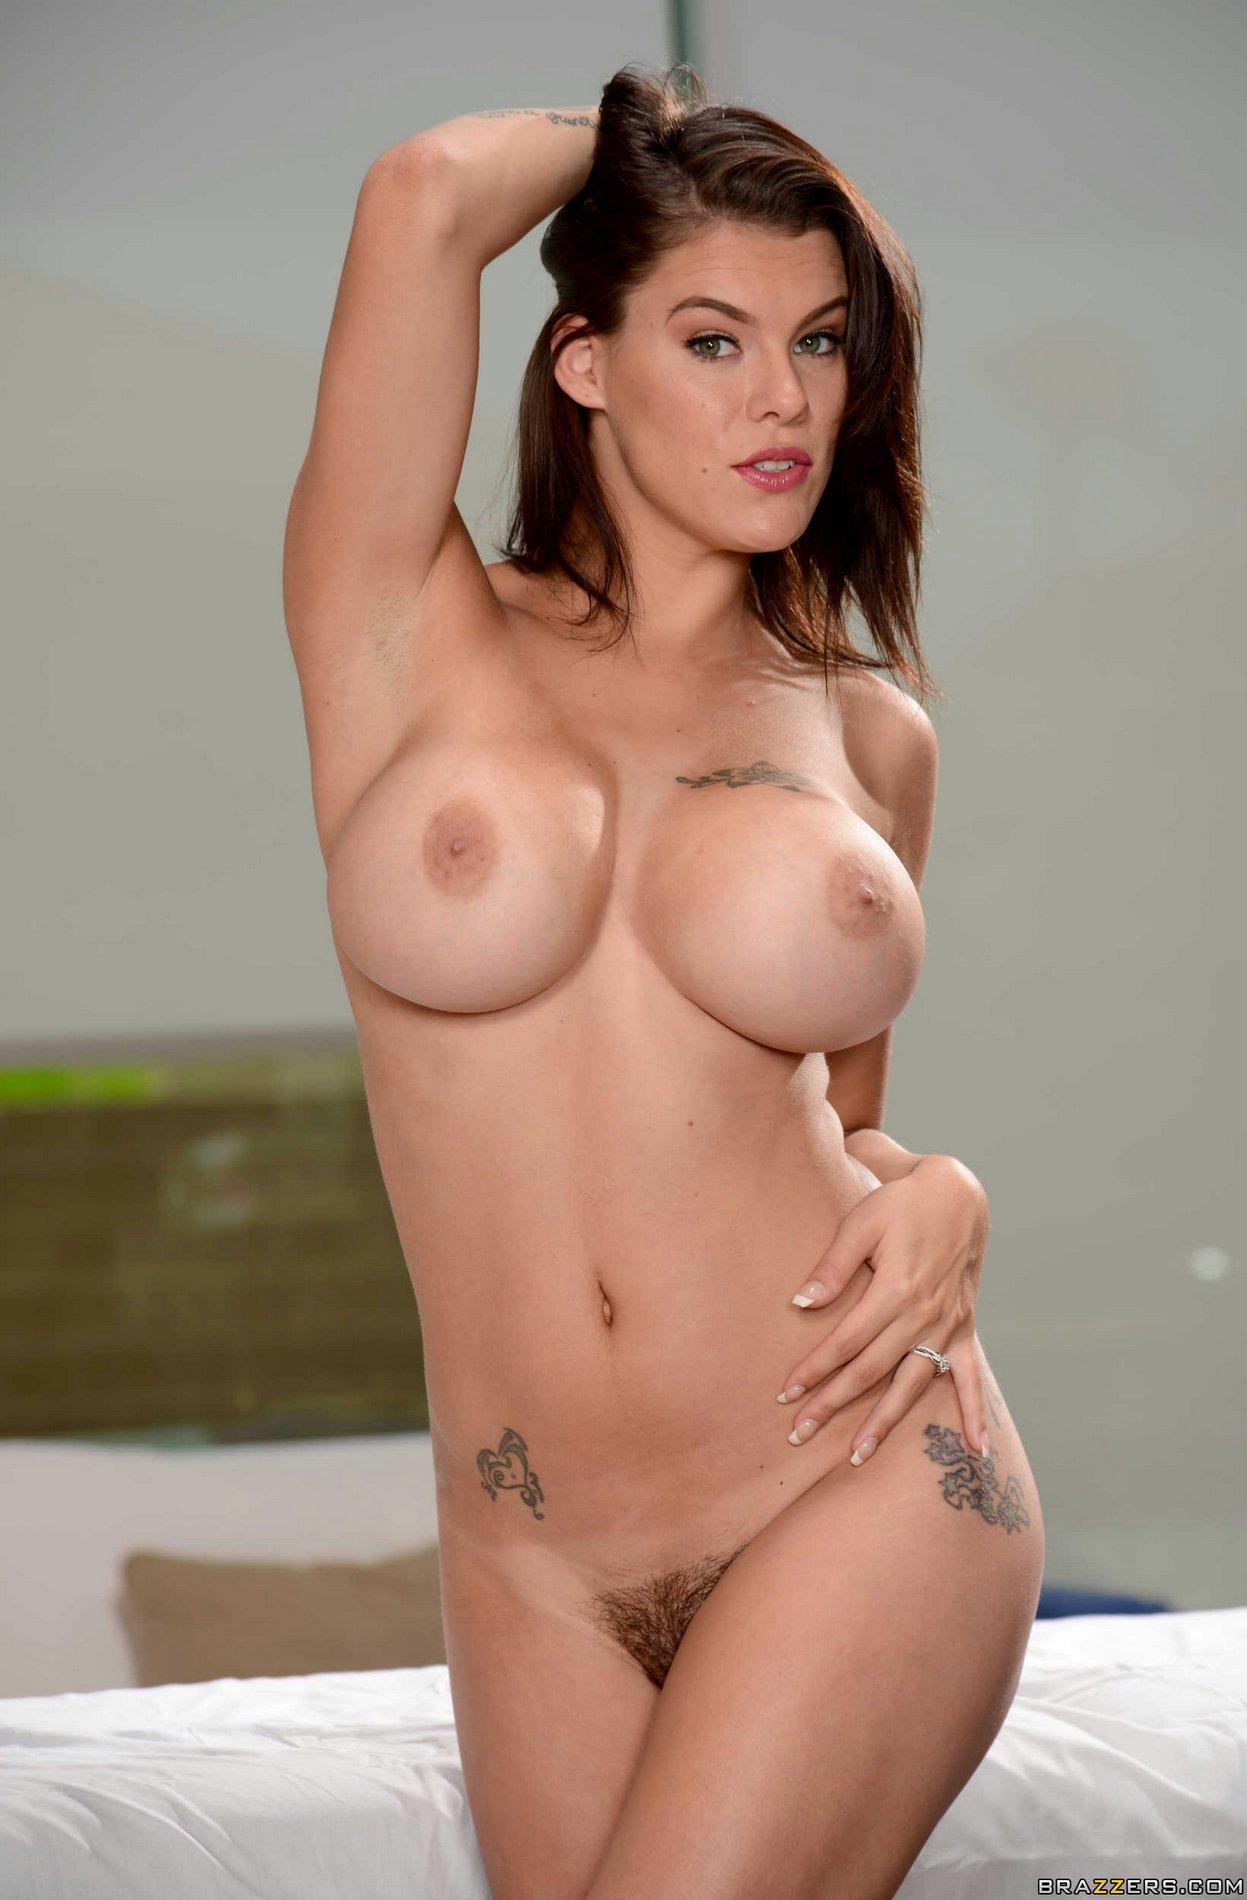 Congratulate, pornstars naked full body for